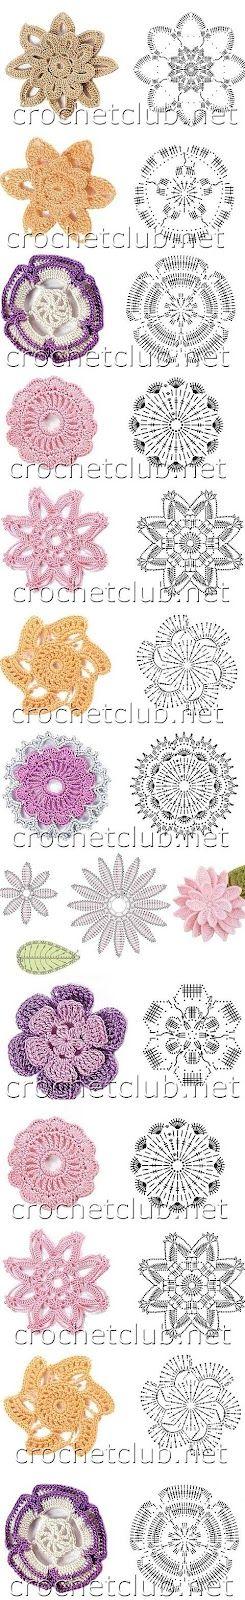 Crochet flowers with diagrams | crochet | Pinterest | Patrones, Flor ...